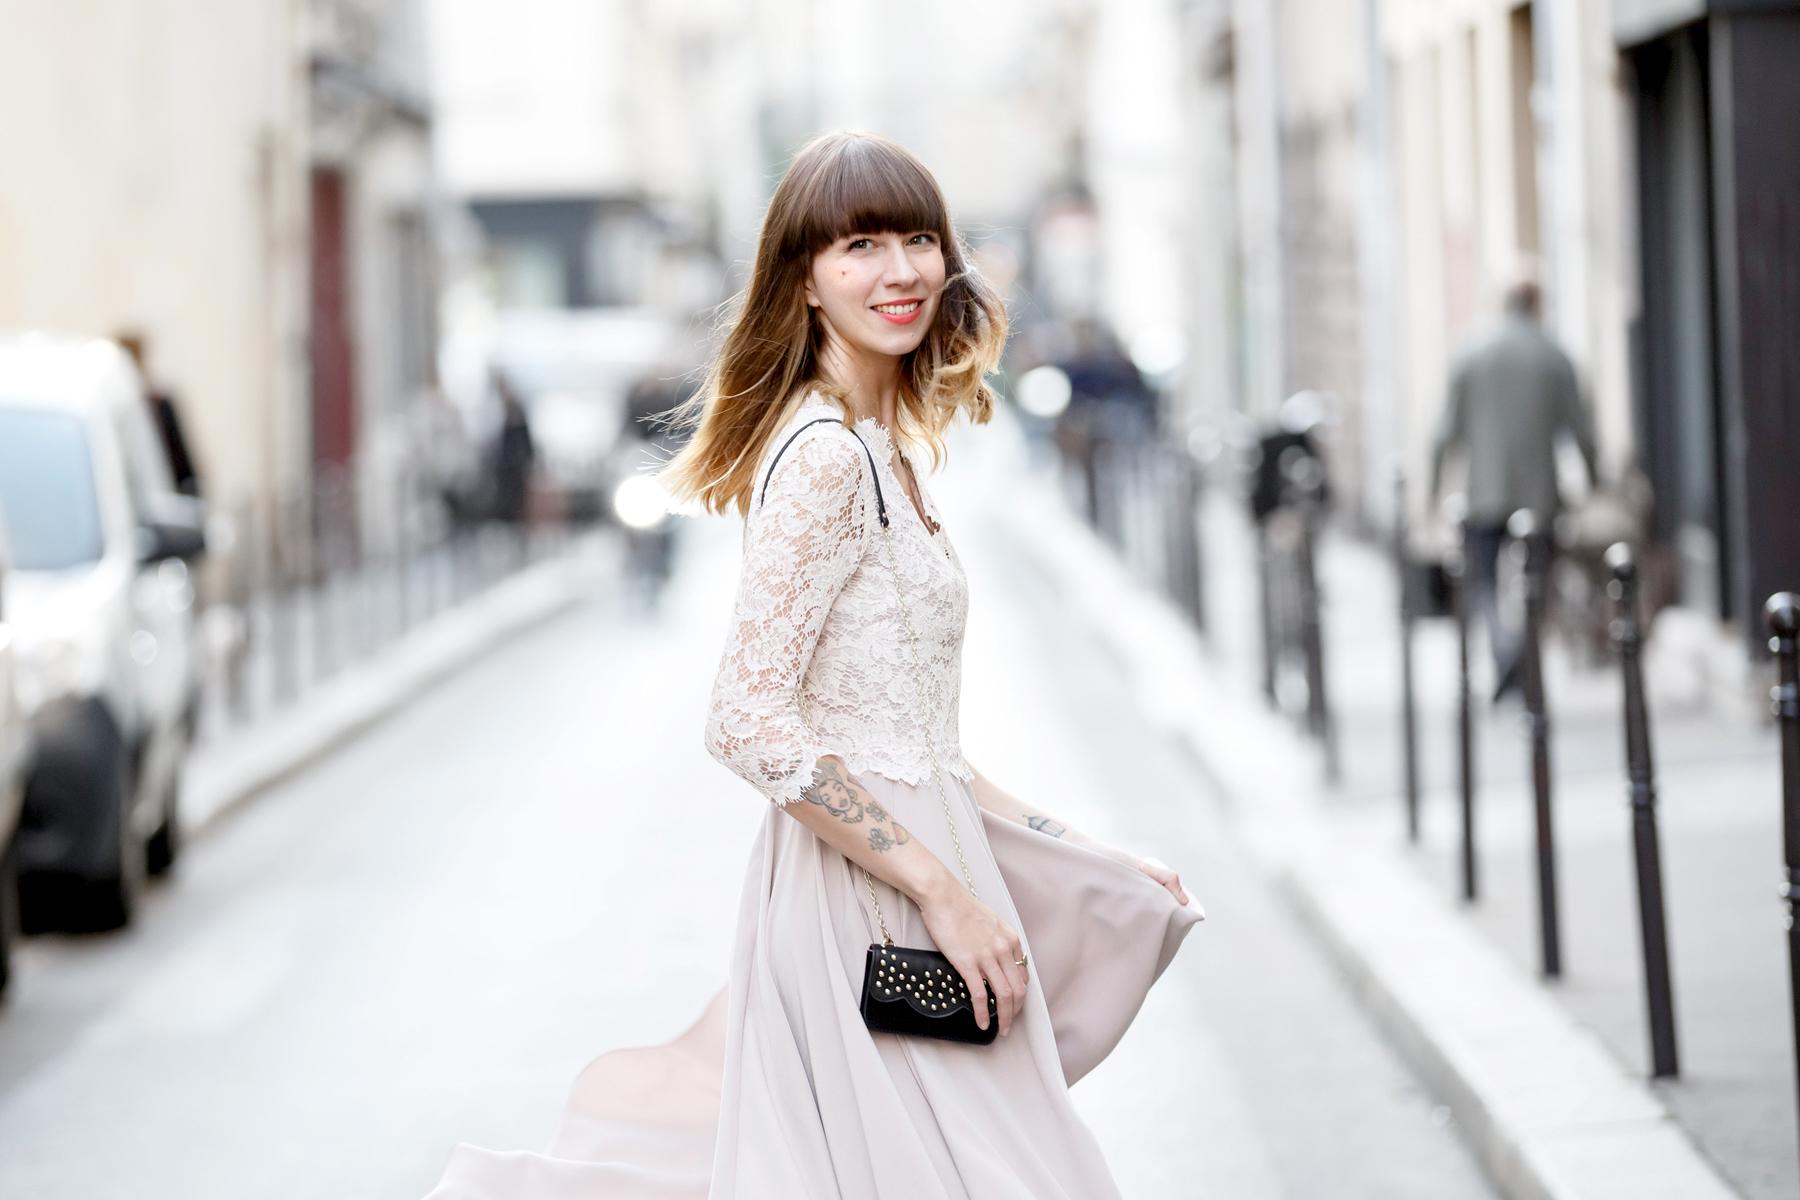 ewa herzog lace dress pastel rose paris le marais pfw fashion week ss16 ricarda schernus cats & dogs blog 2